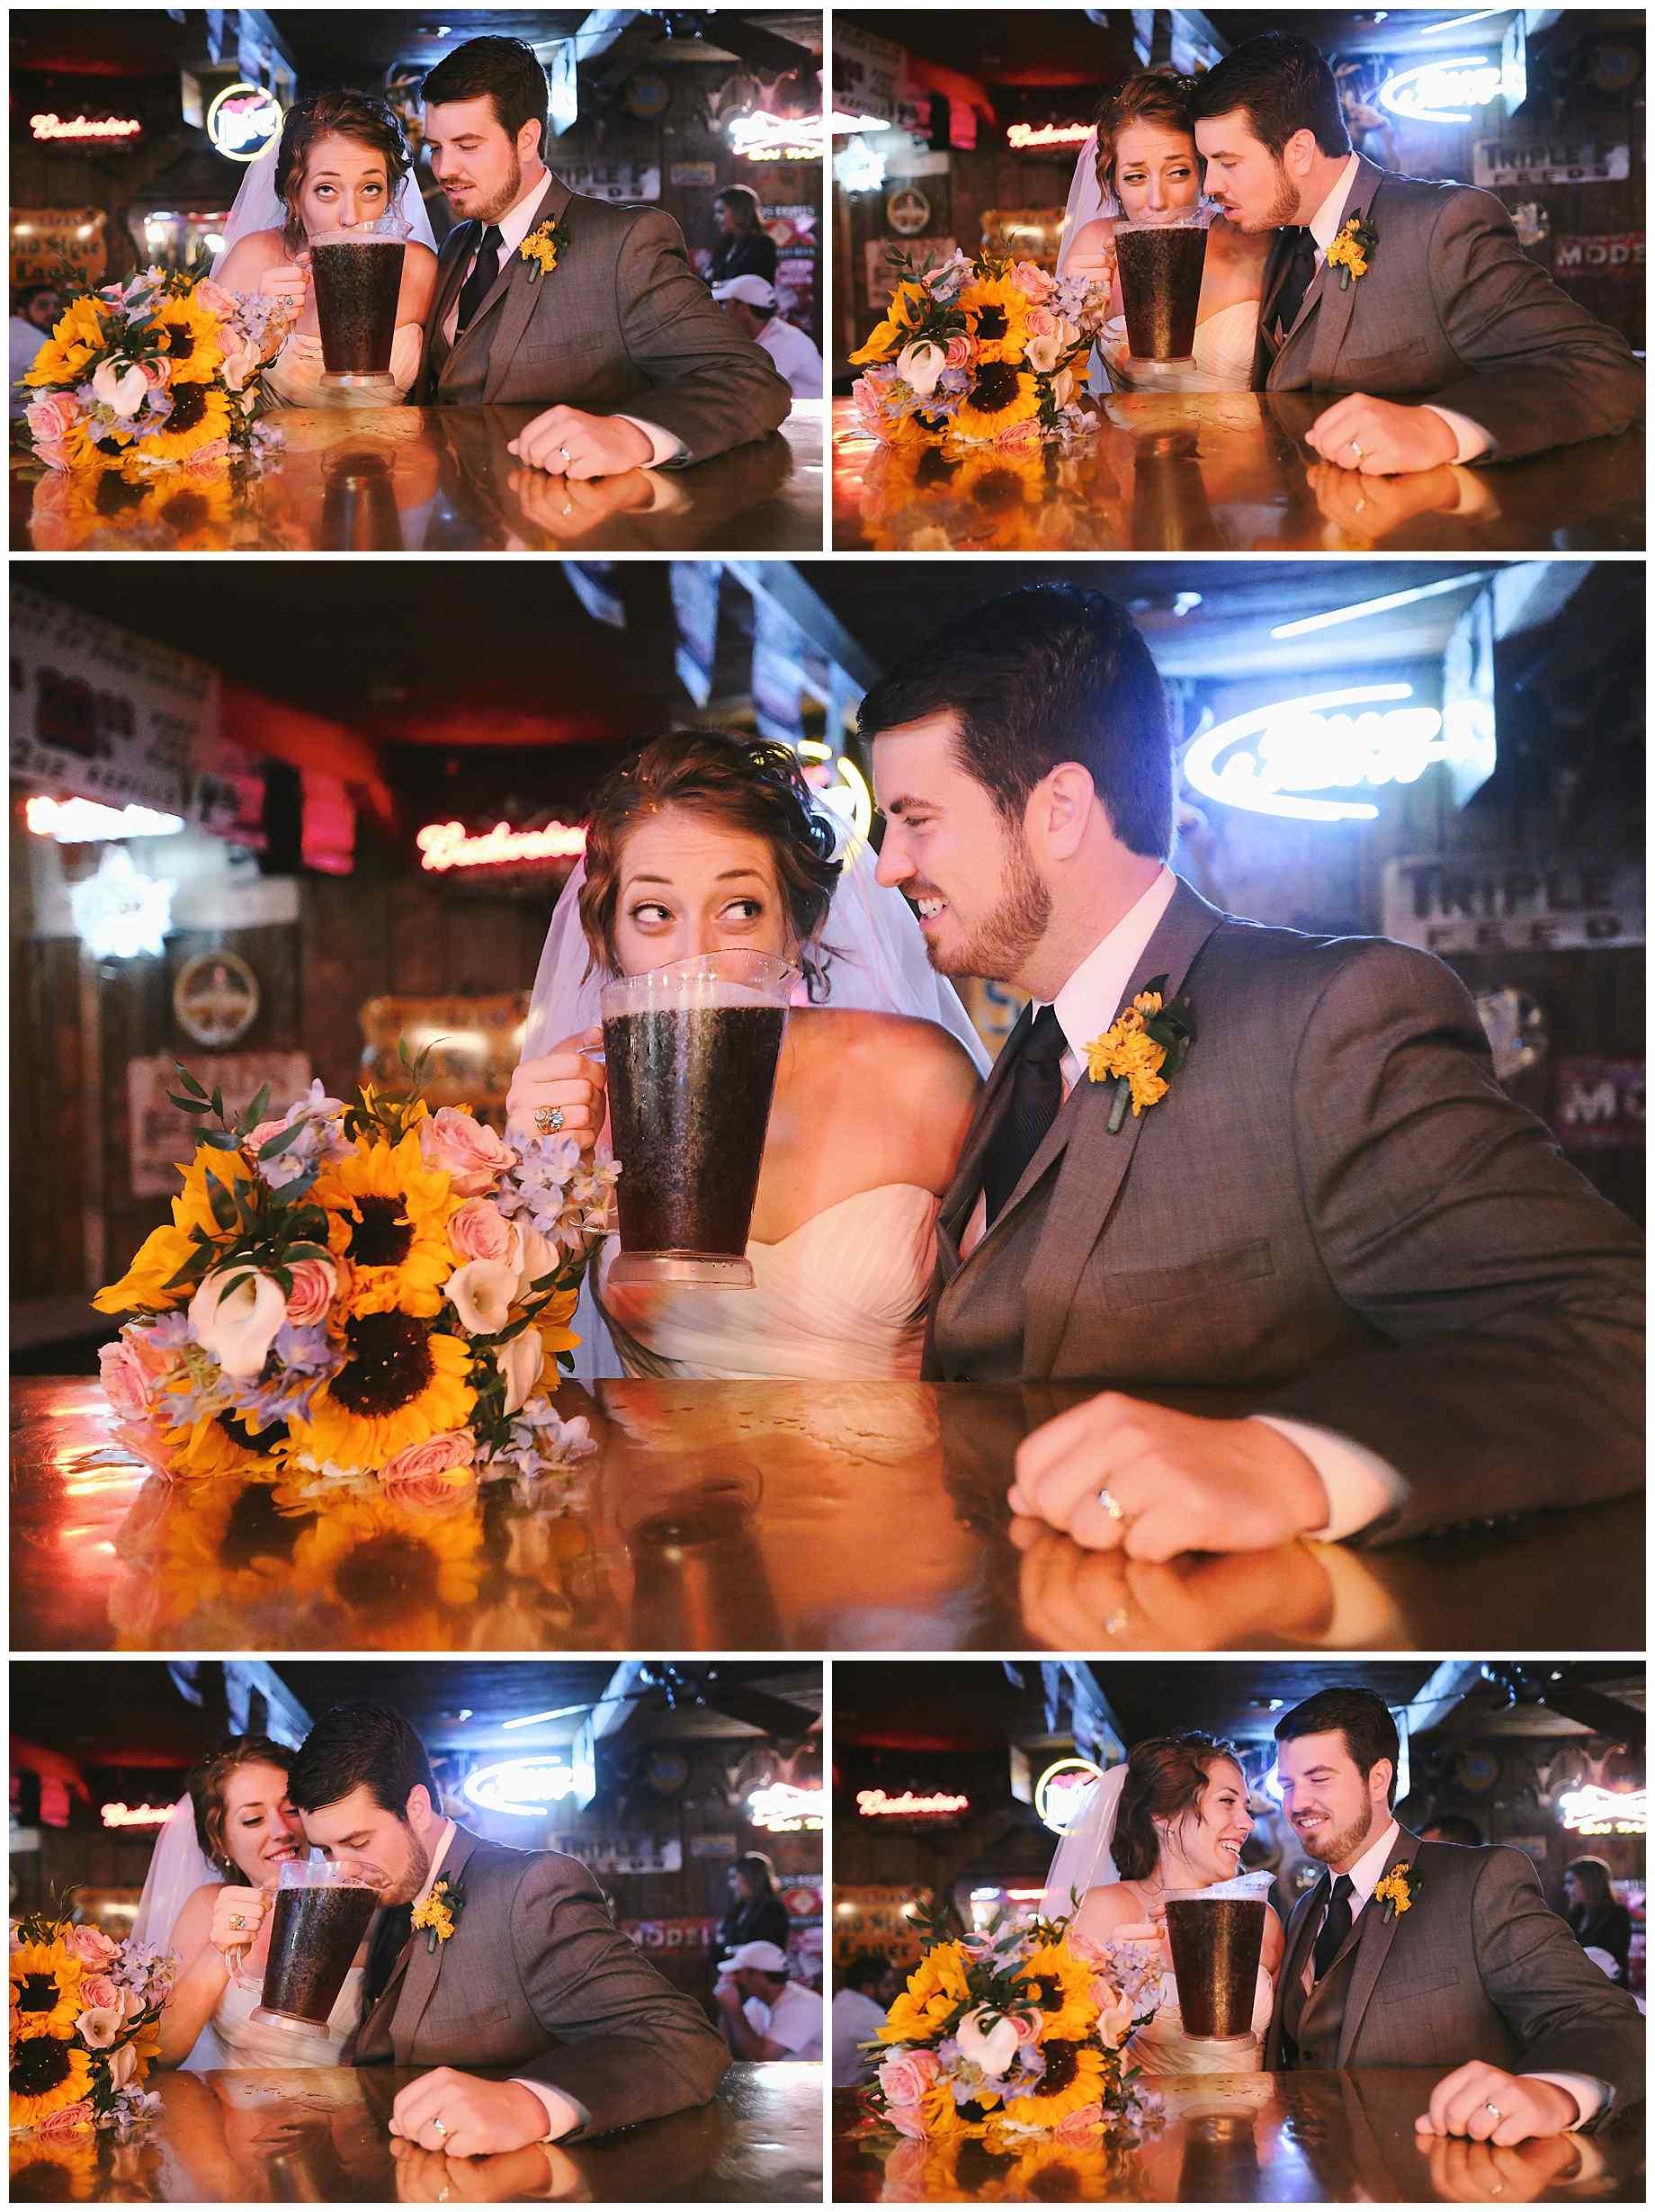 dixie-chicken-wedding-photos-10